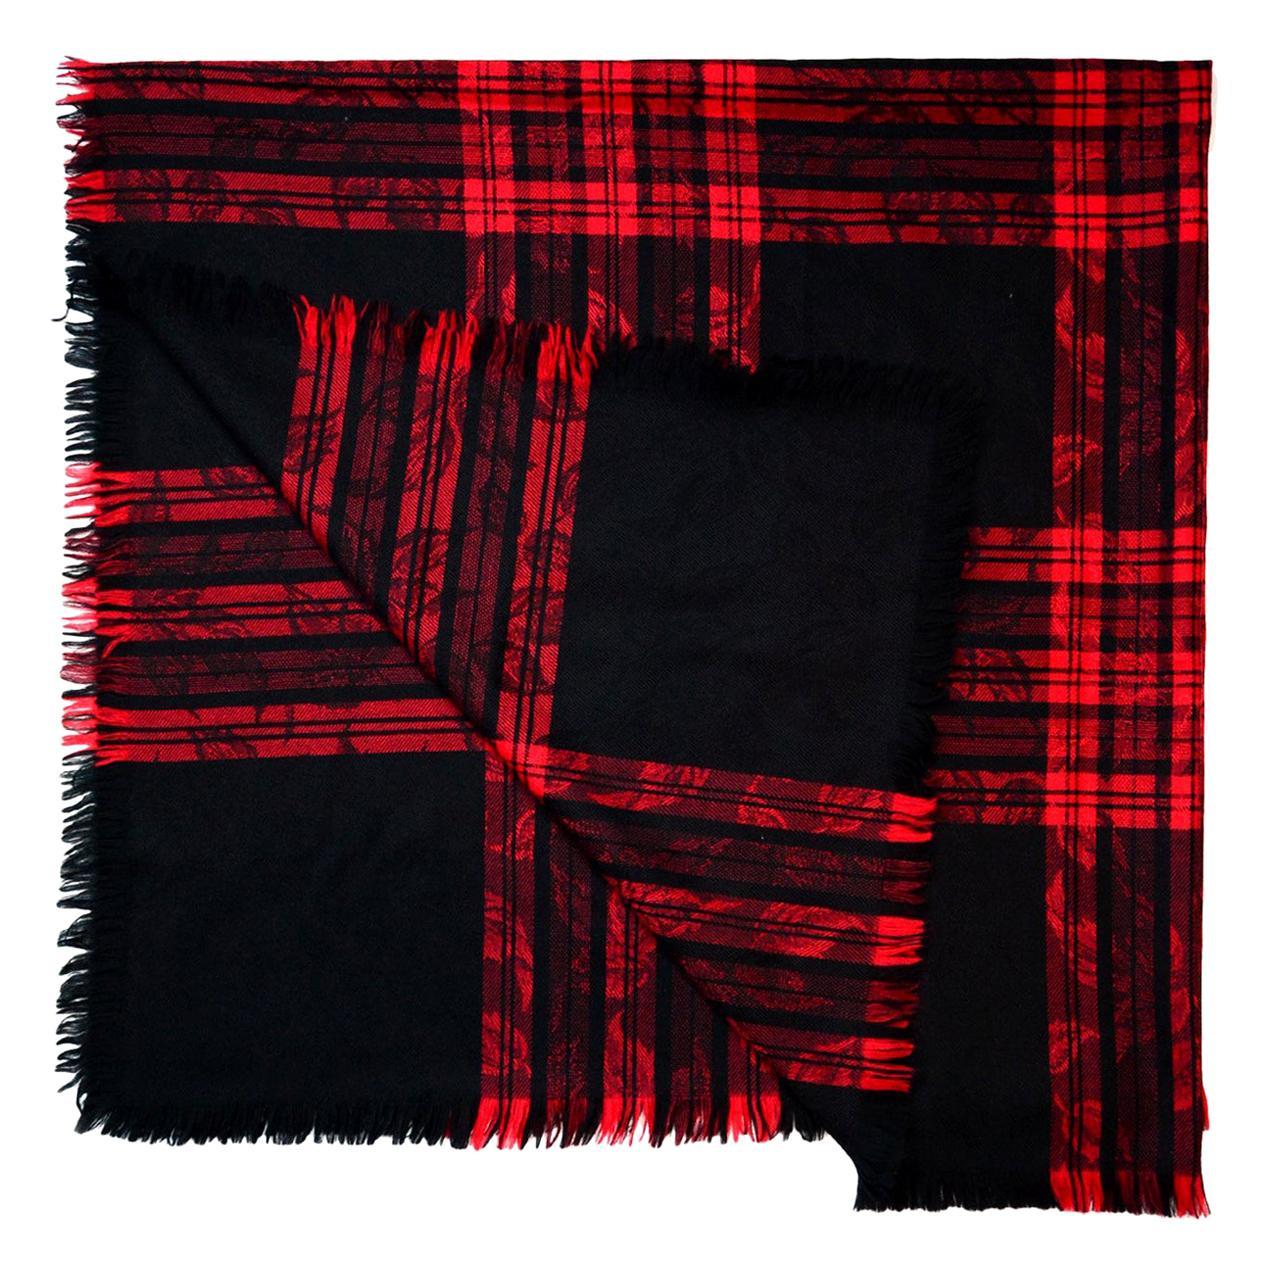 Yves Saint Laurent YSL Vintage Red/Black Jacquard Plaid Blanket Scarf